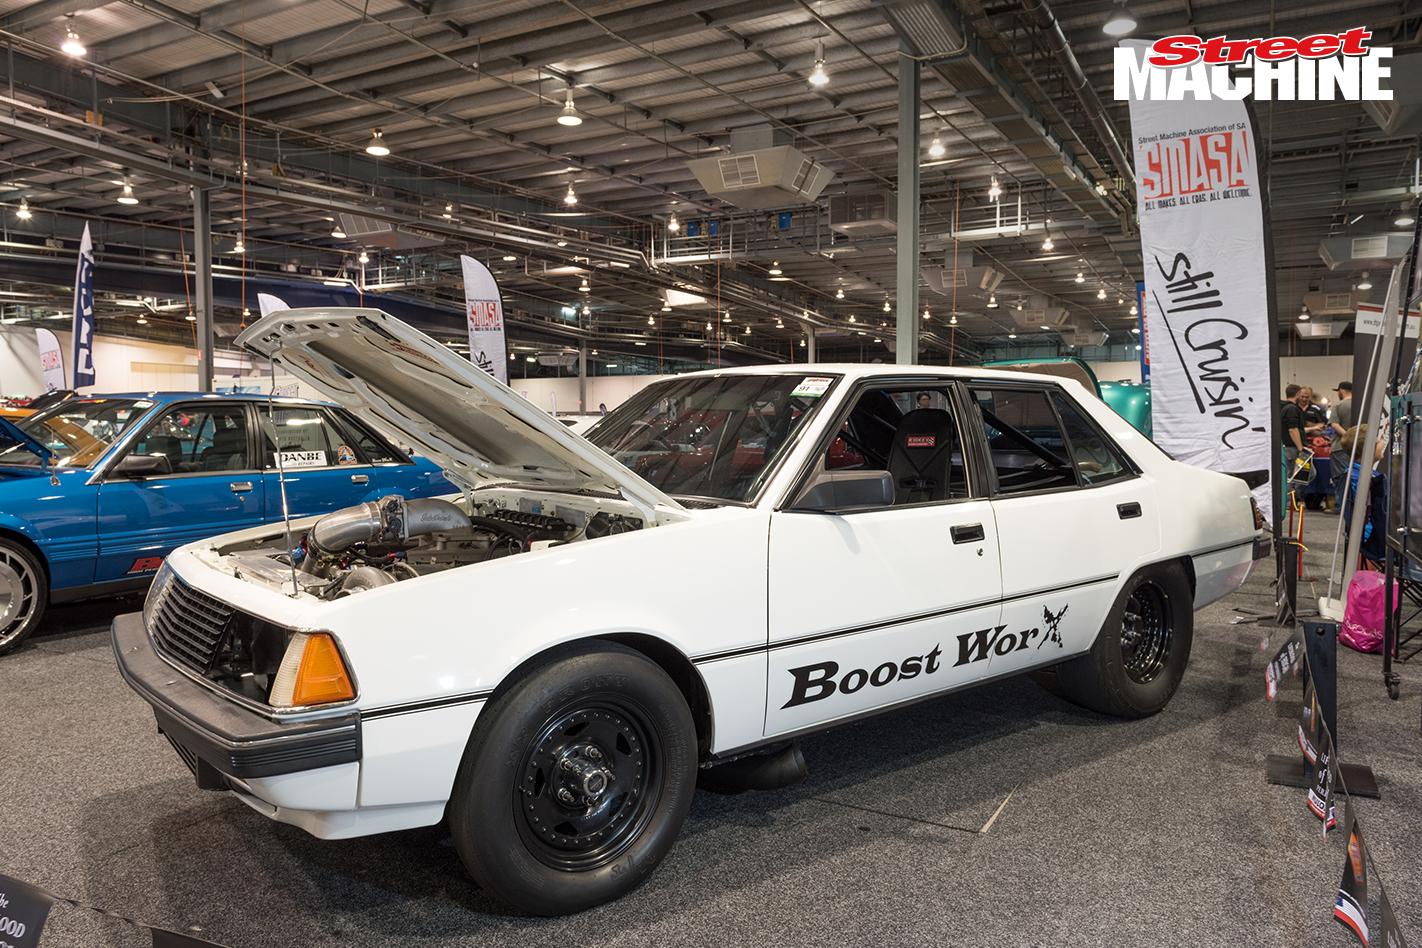 Mitsubishi Sigma Turbo V8